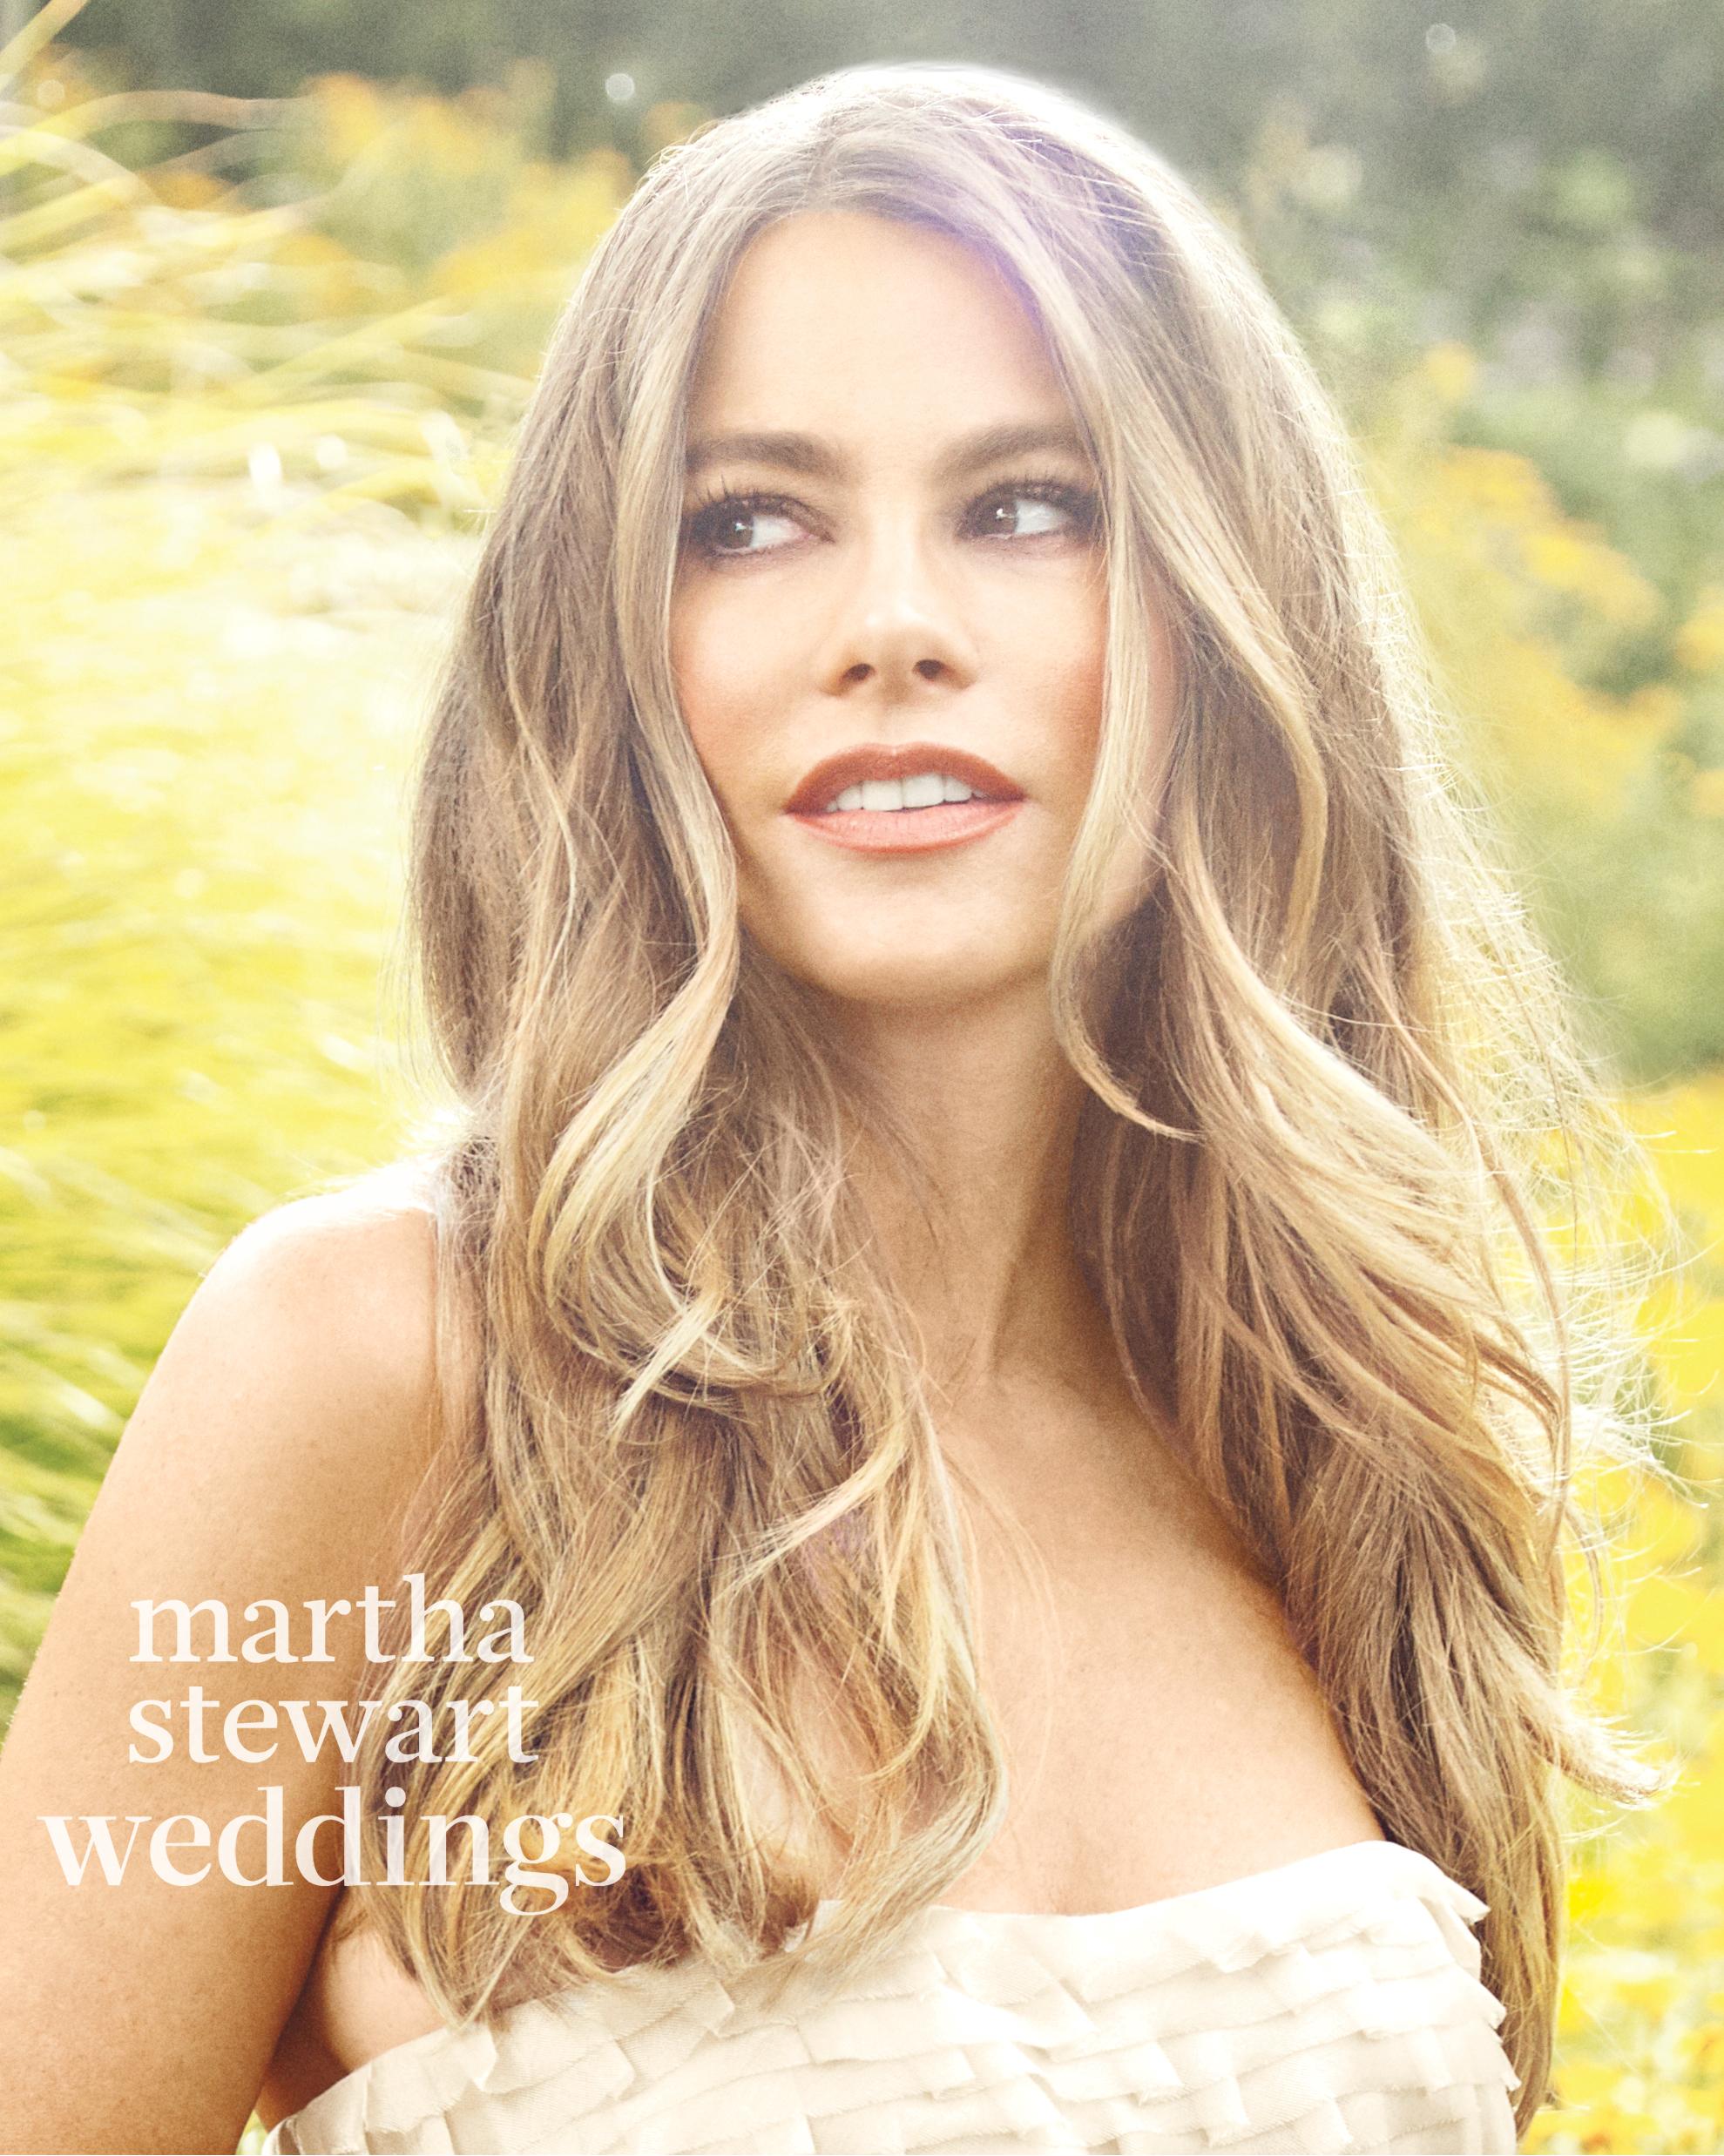 sofia-vergara-m05-gold-bridal-gown-038v2-d112252-r1-beauty1-0815.jpg